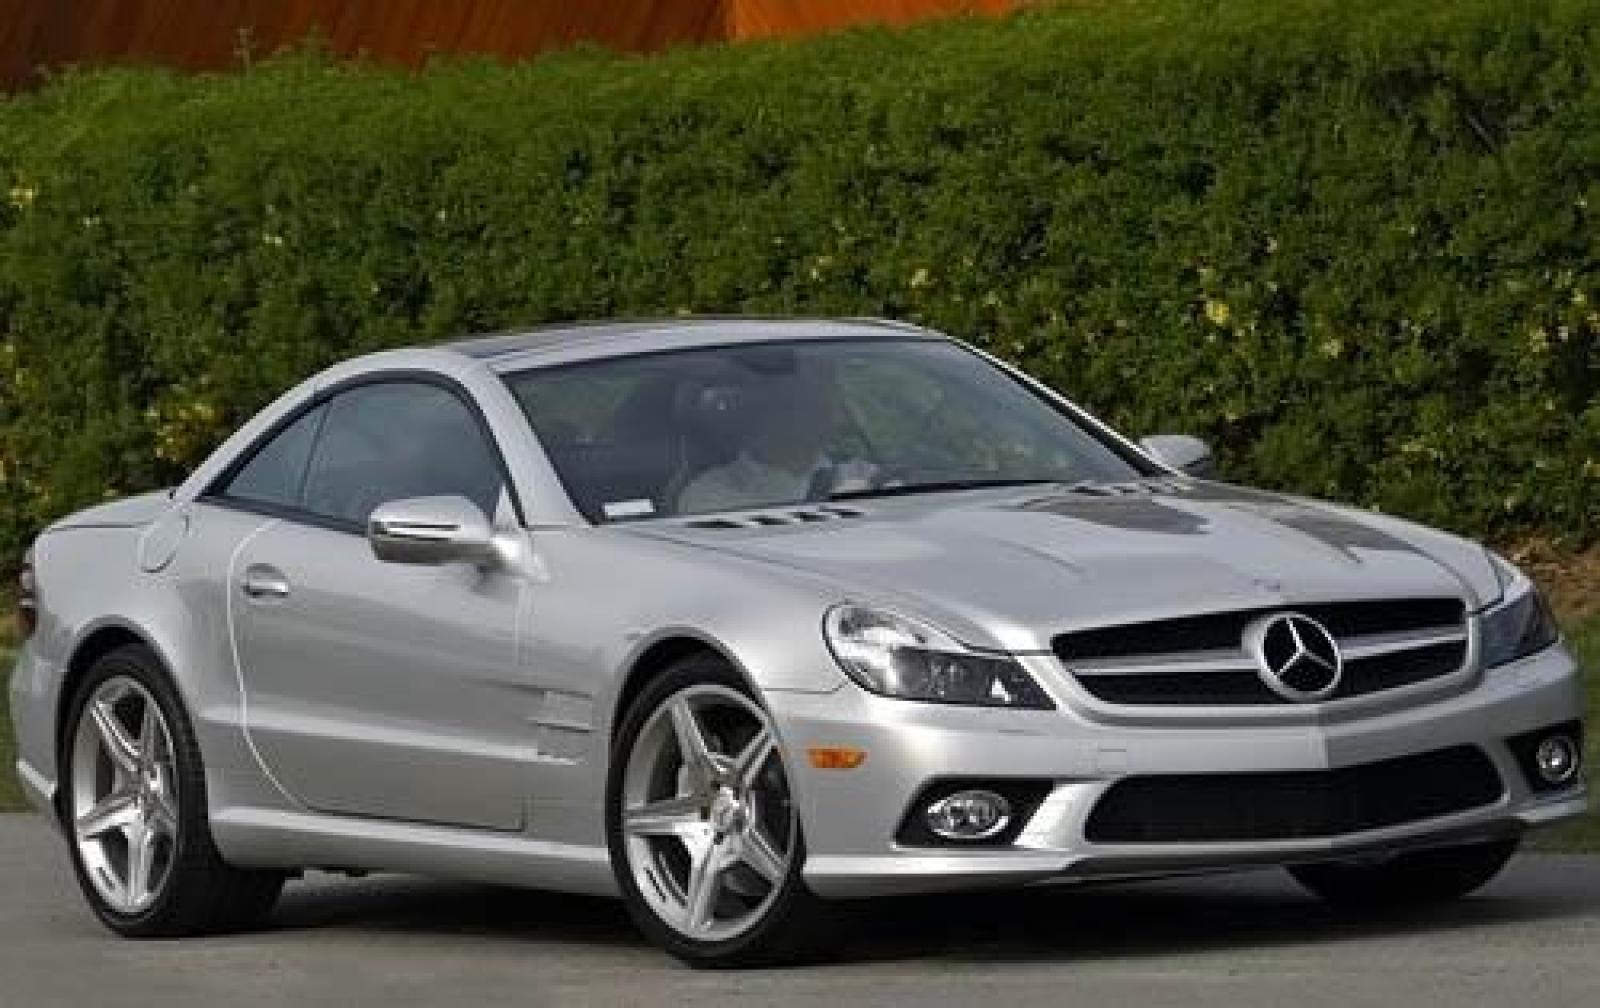 2012 mercedes benz sl class information and photos for Mercedes benz amg 550